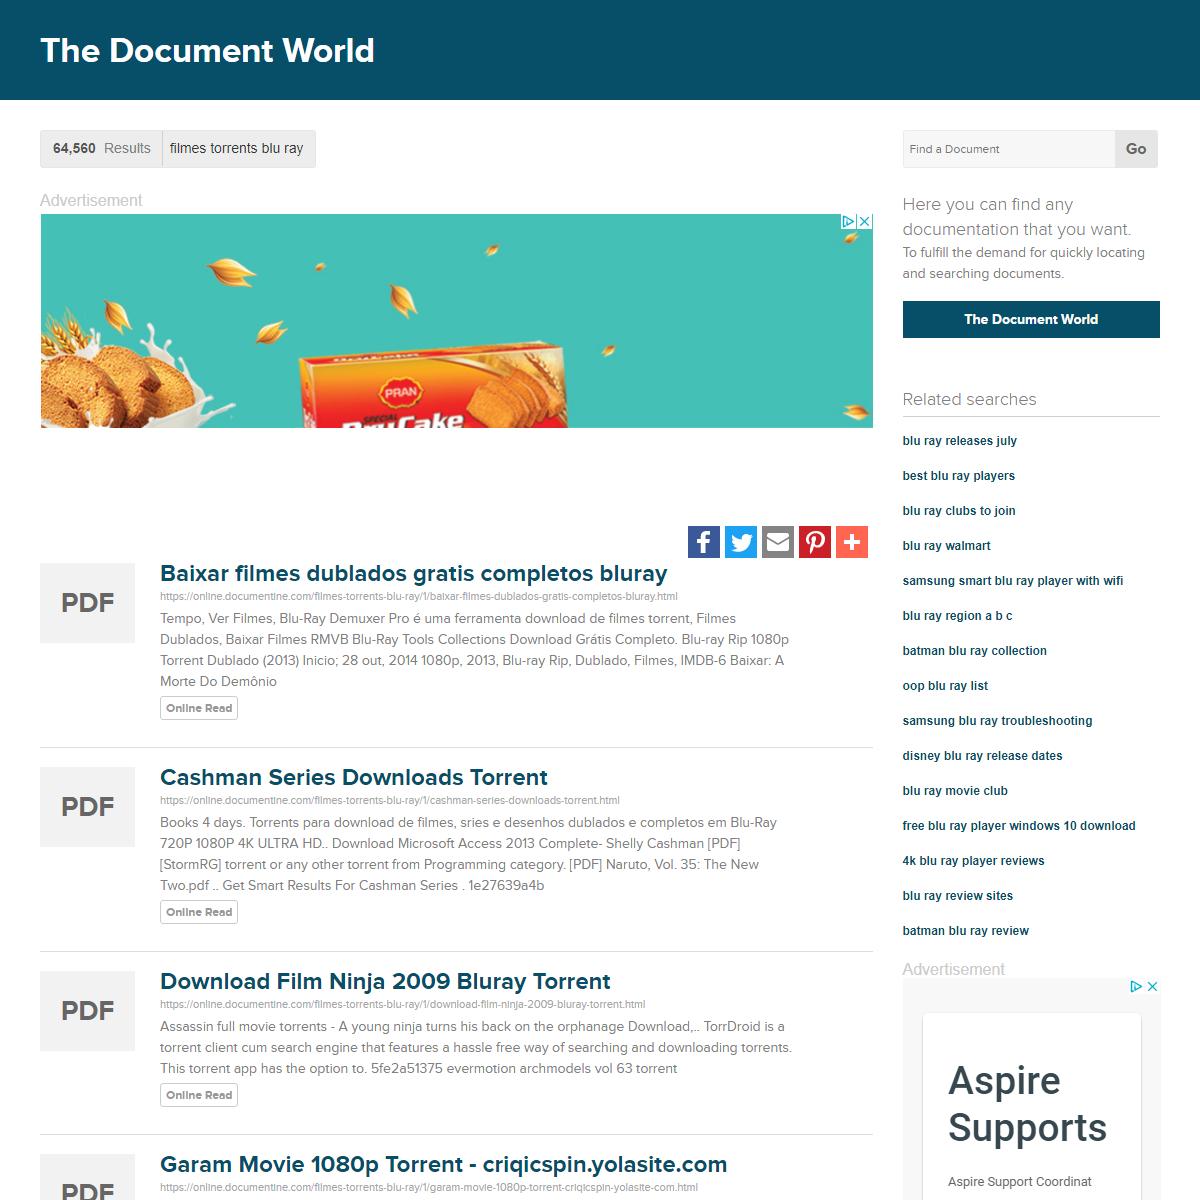 filmes torrents blu ray - Documentine.com